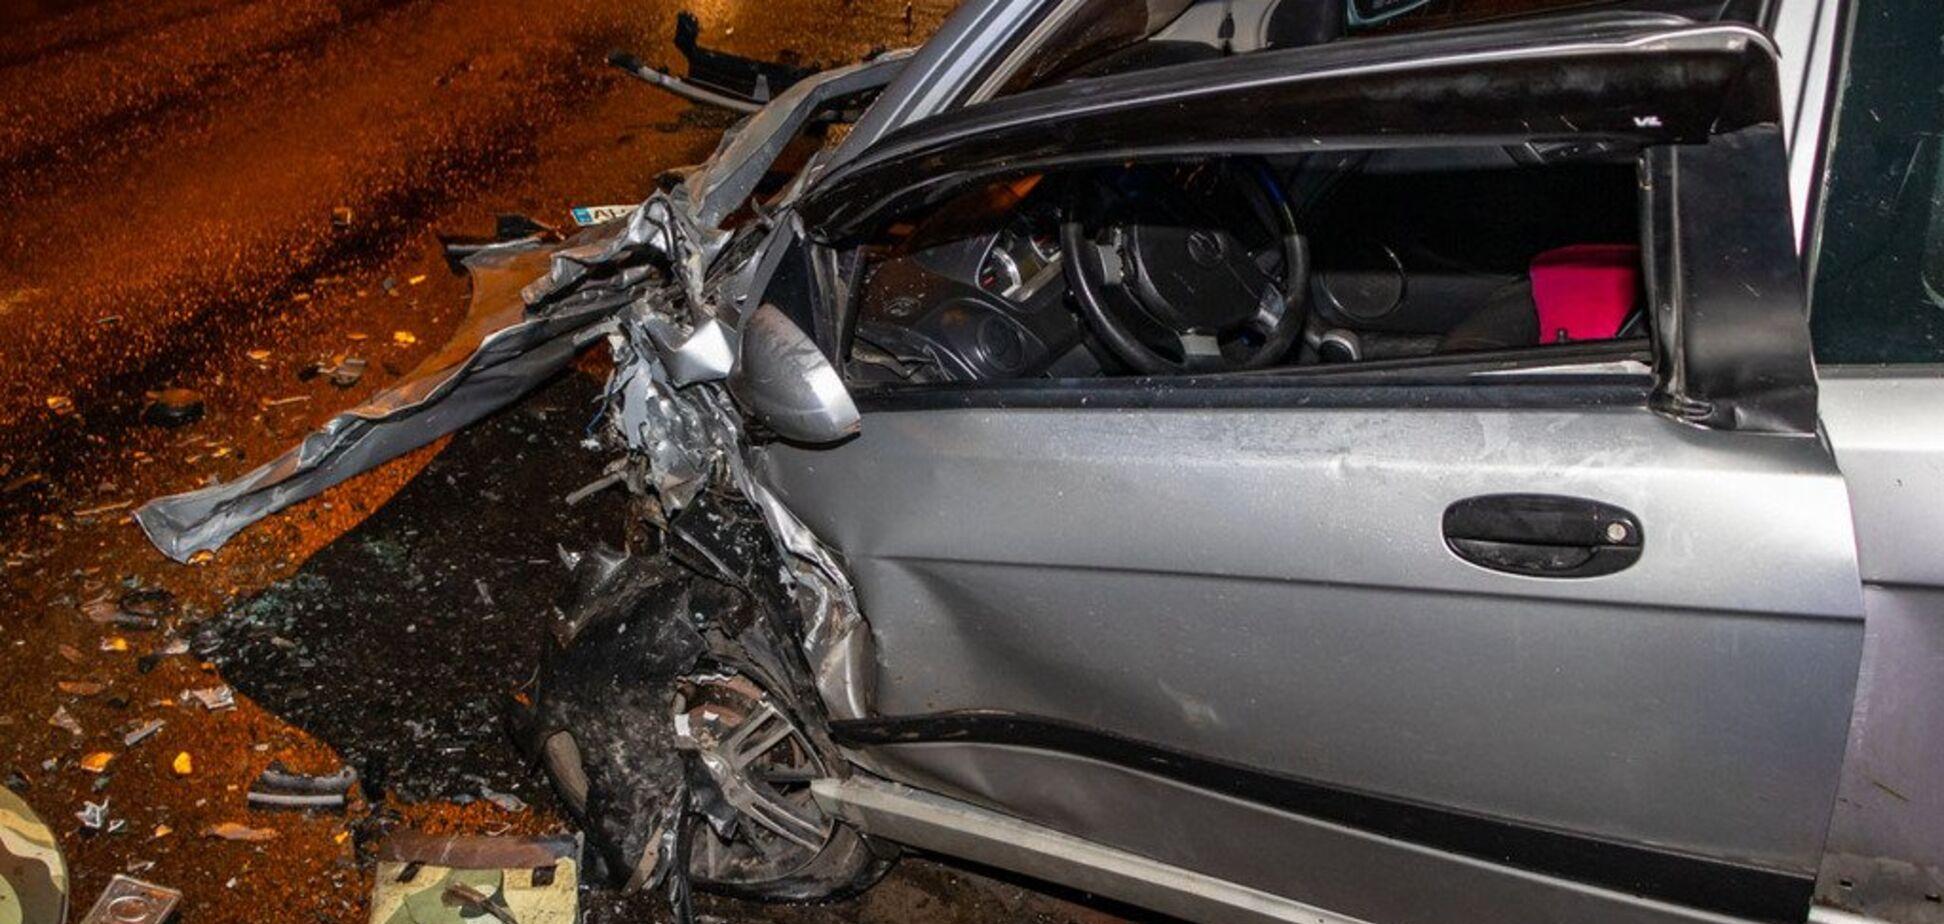 От удара машину выкинуло на тротуар: в Днепре произошло ДТП. Фото и видео